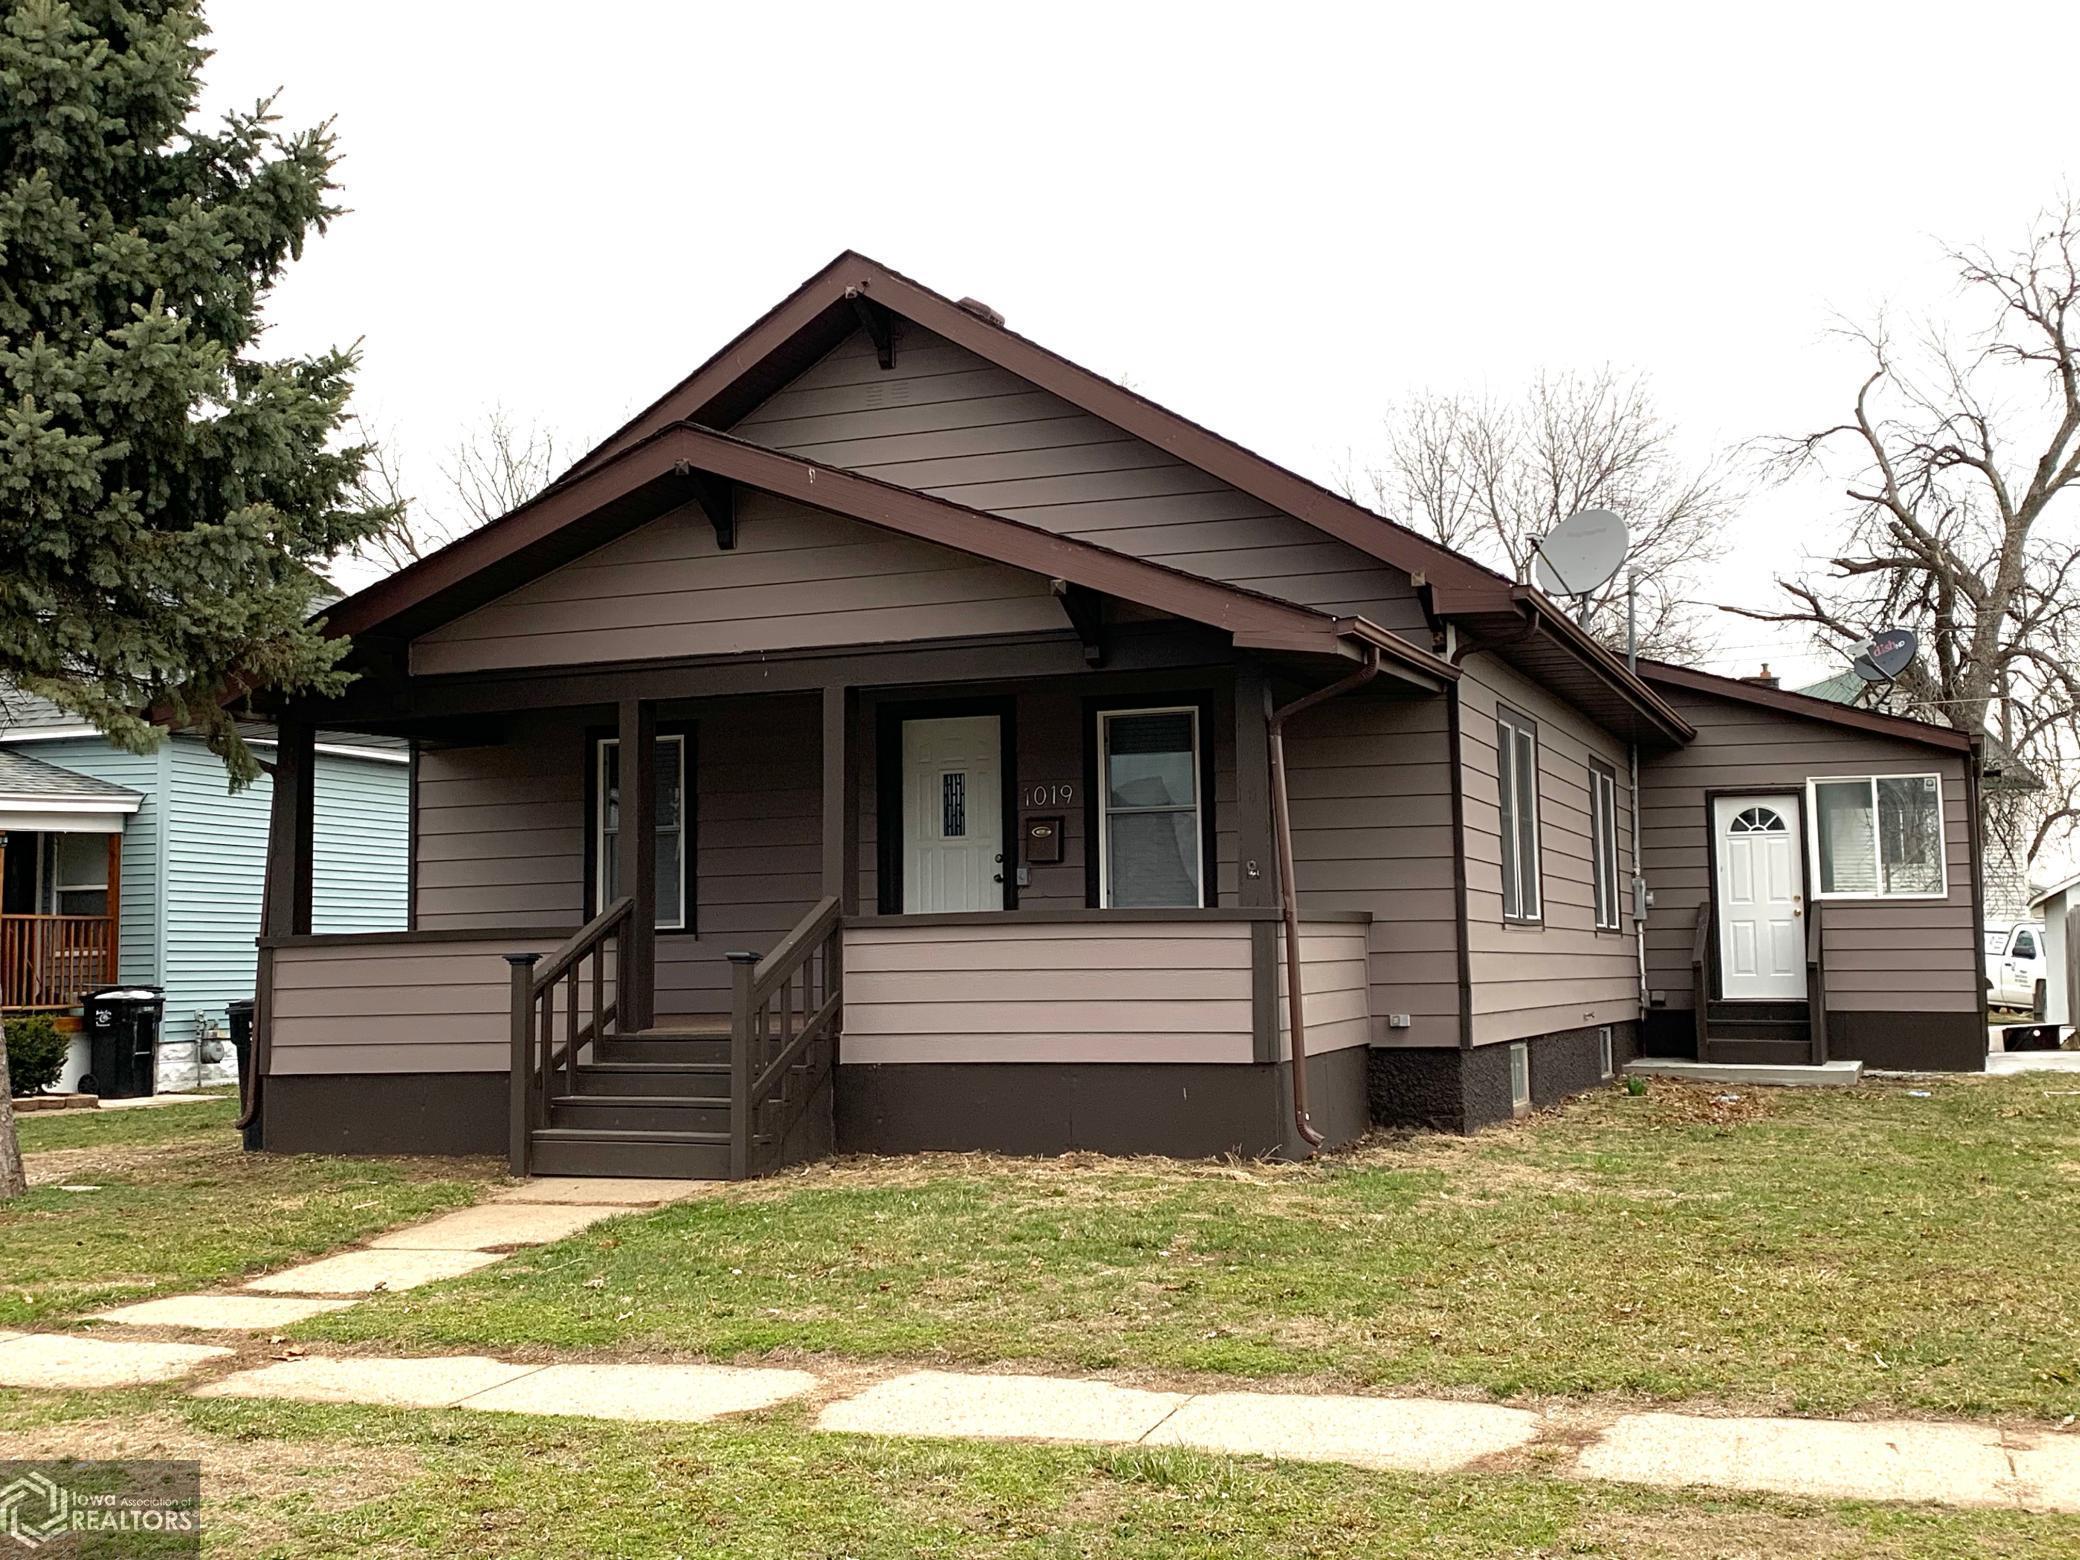 150 Grandview Avenue, Ottumwa, IA 52501   MLS: 5734356